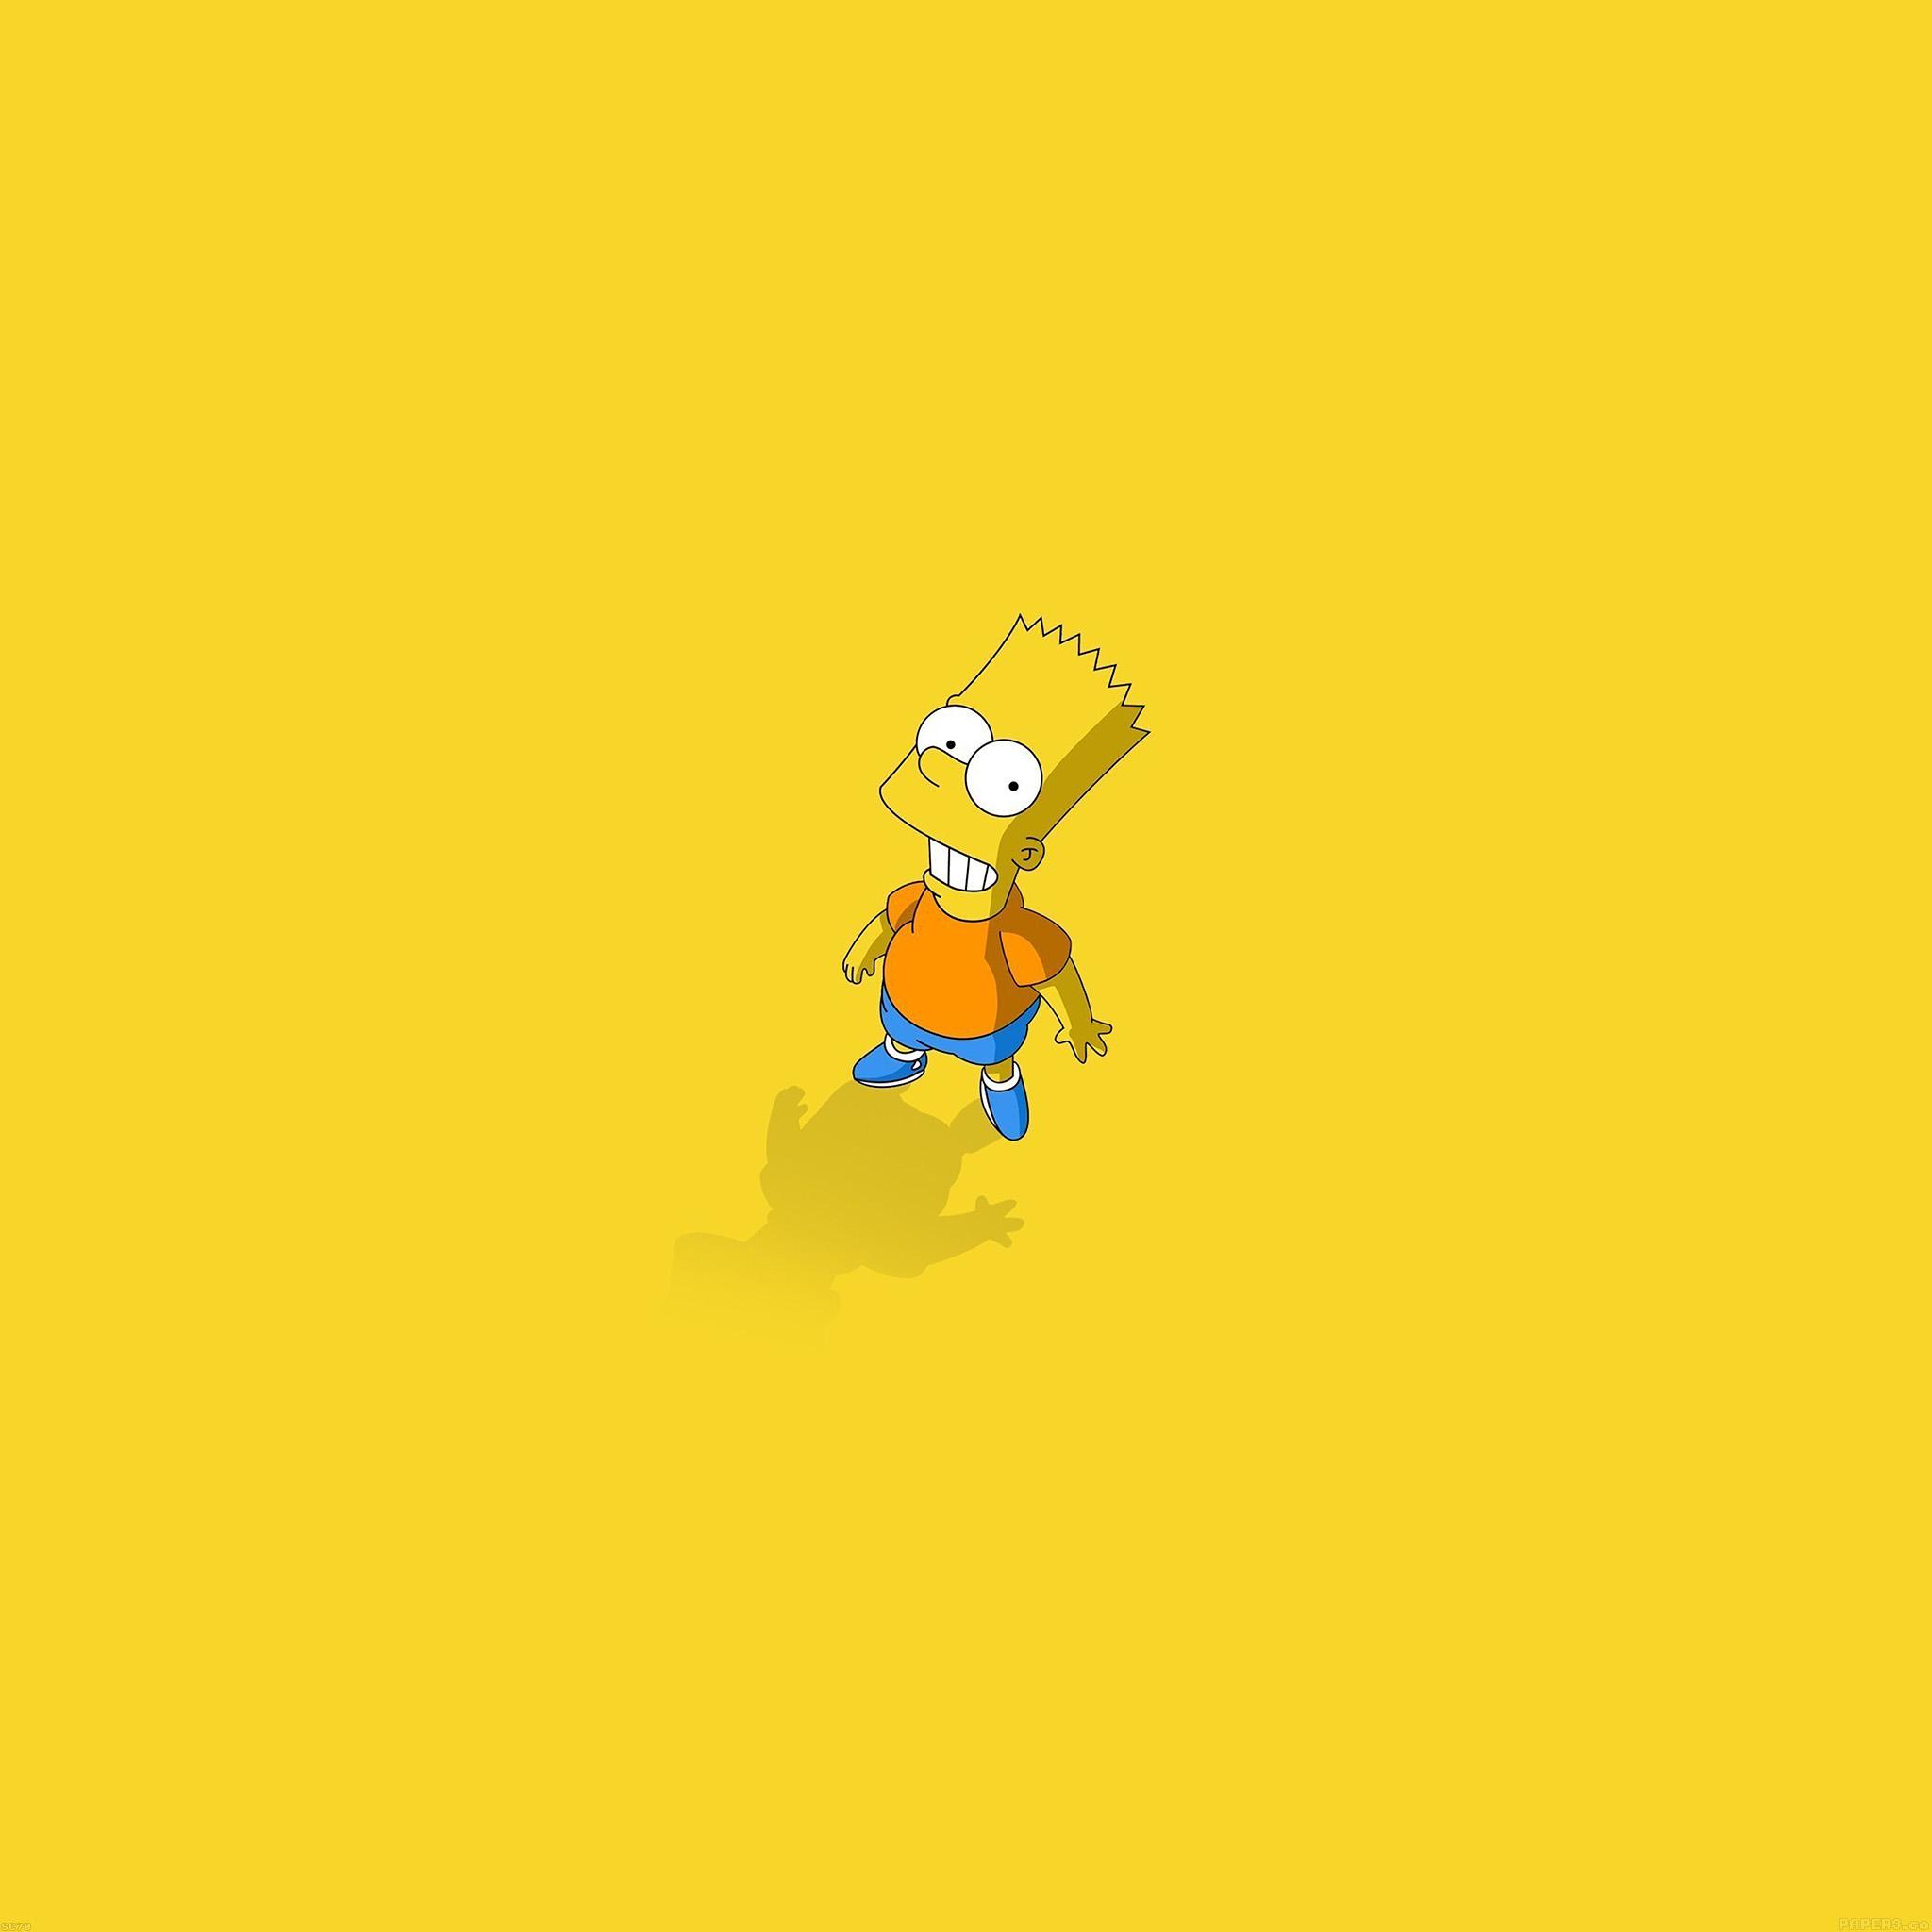 Simpsons Iphone X Wallpaper Af48 Hi I Am Bart Simpsons Minimal Cartoon Papers Co